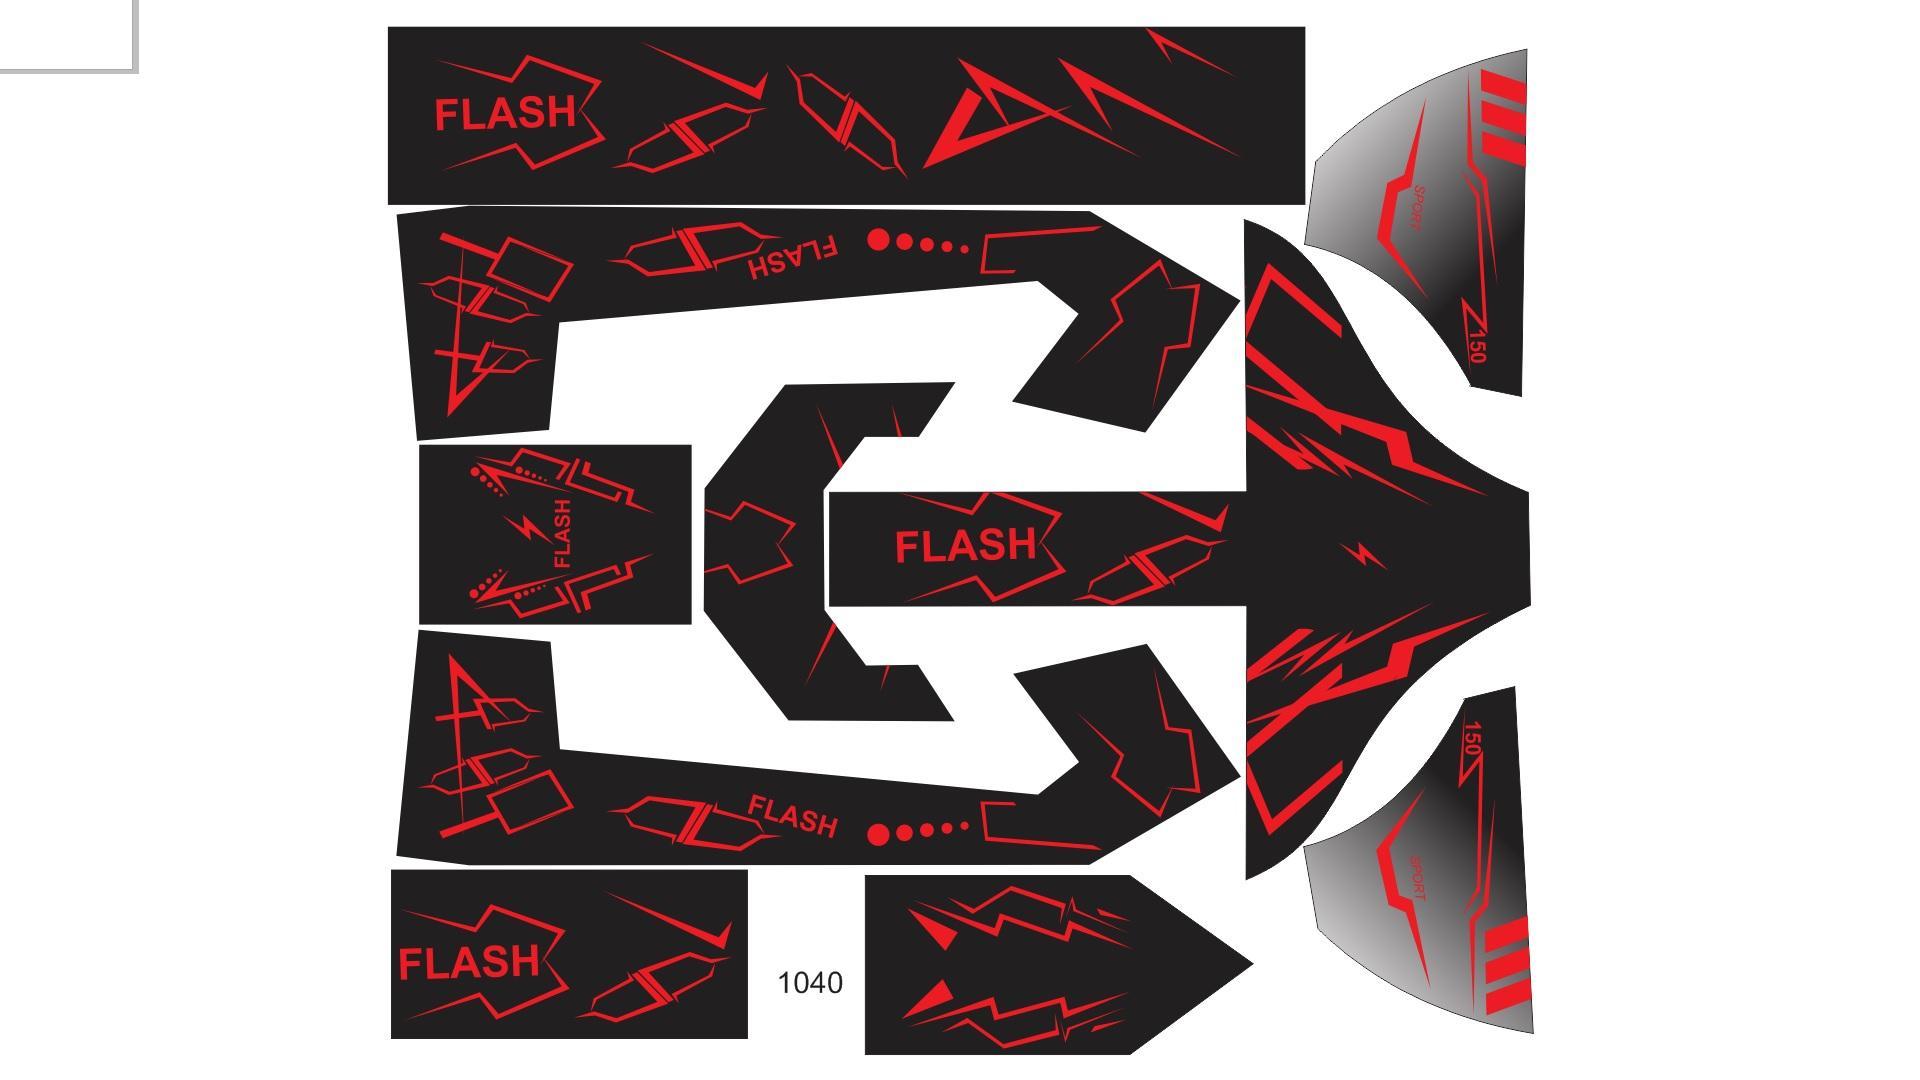 tem trùm 133s mẫu Flash